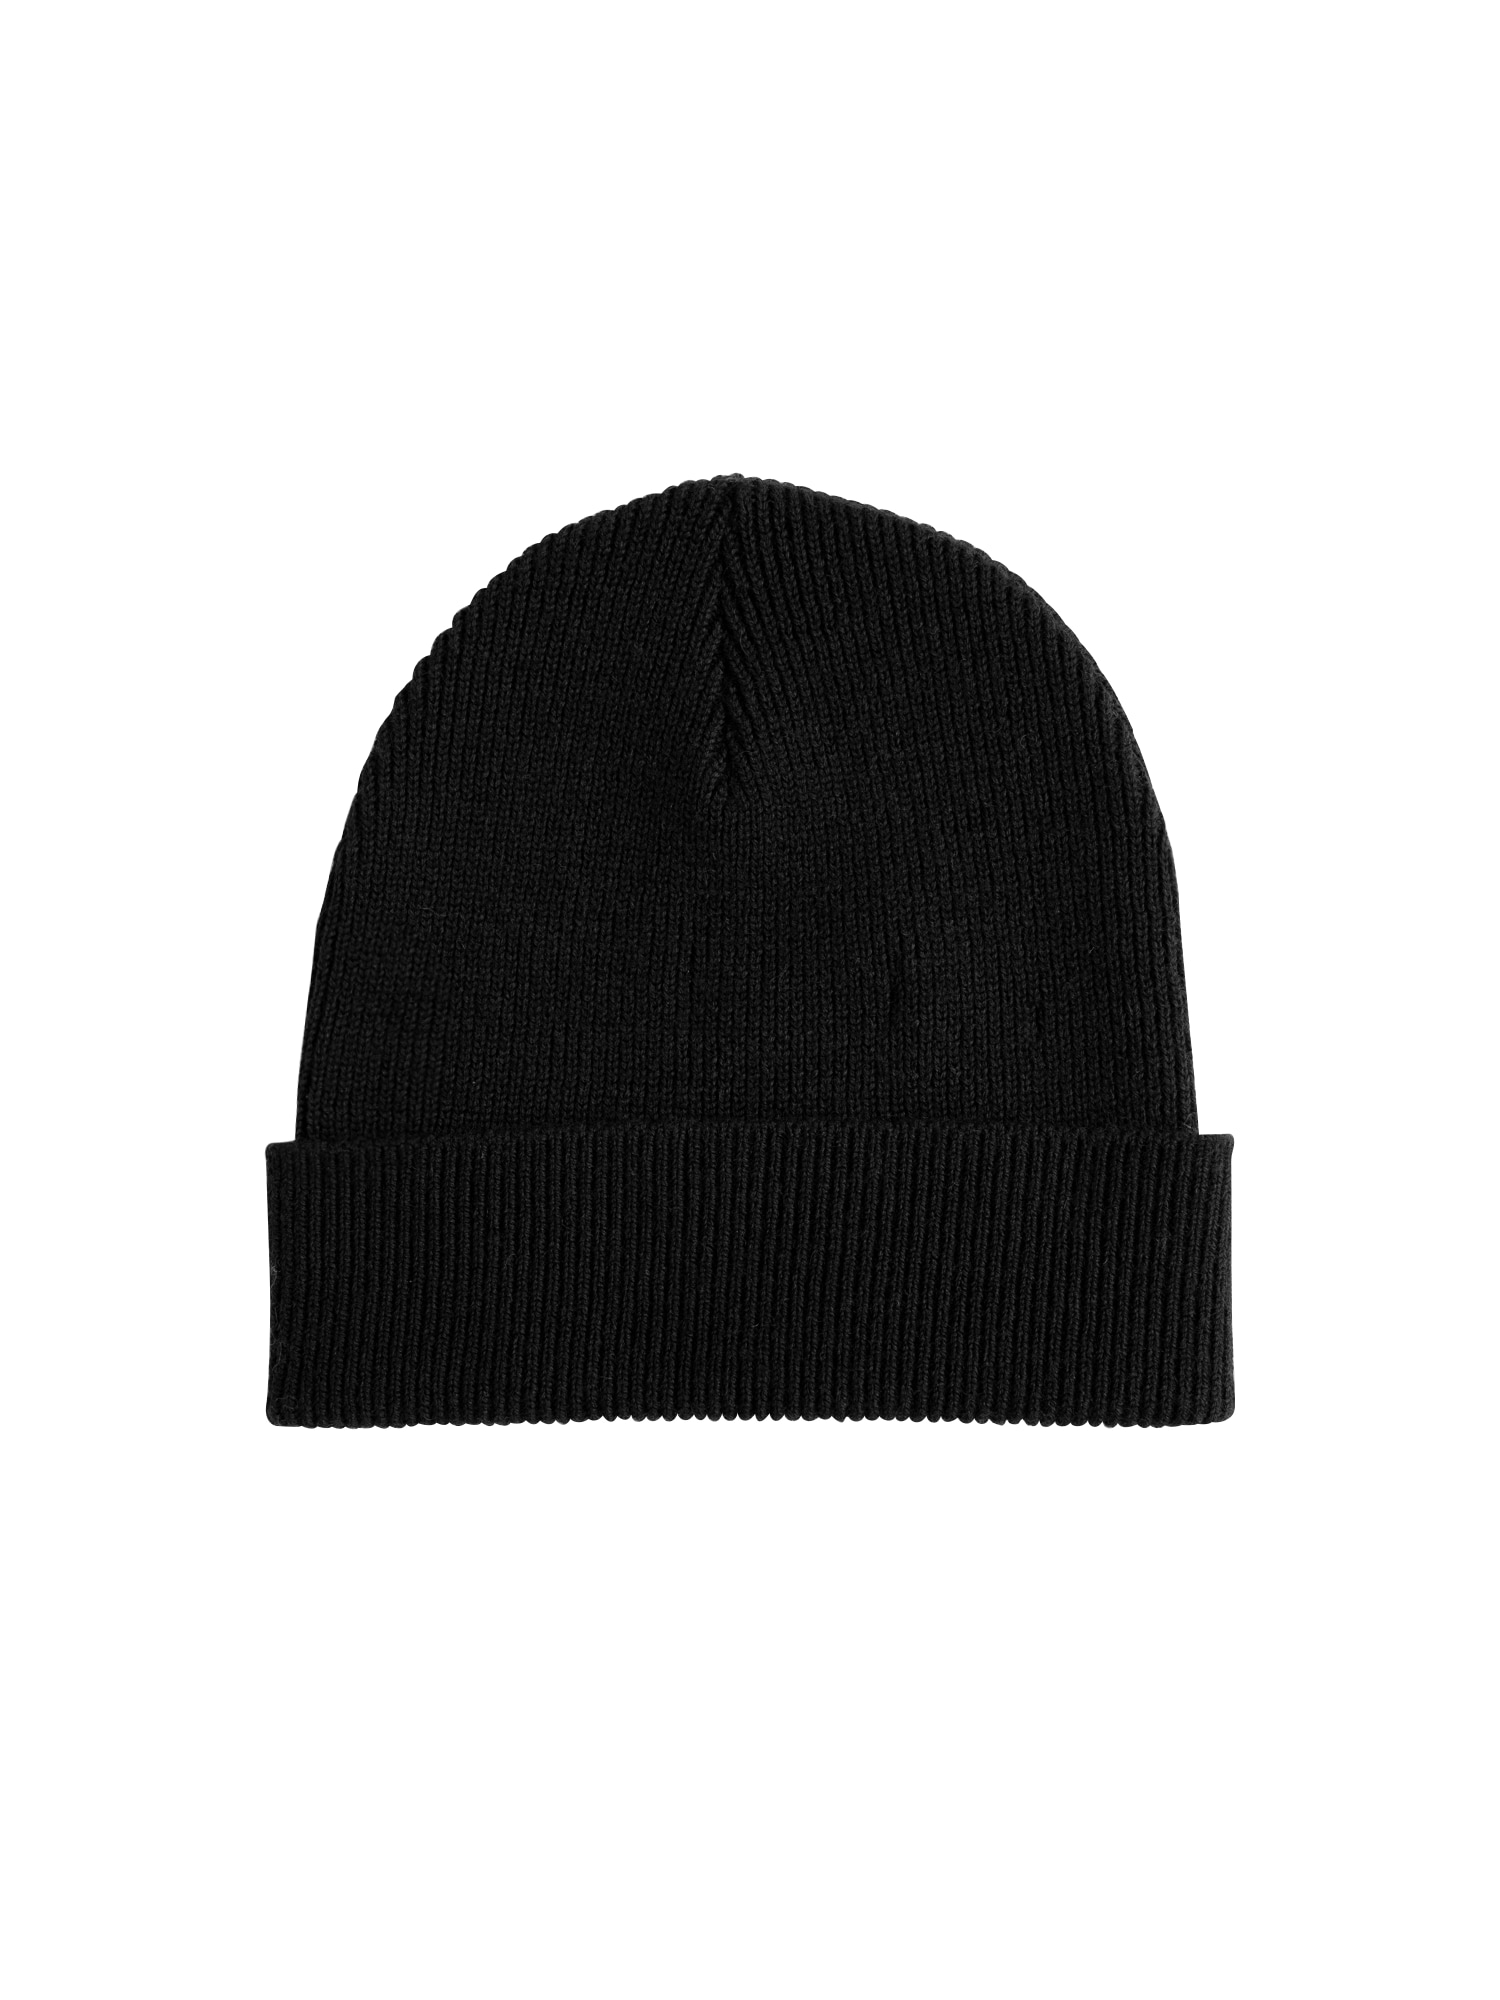 EDITED Megzta kepurė 'Enya' juoda